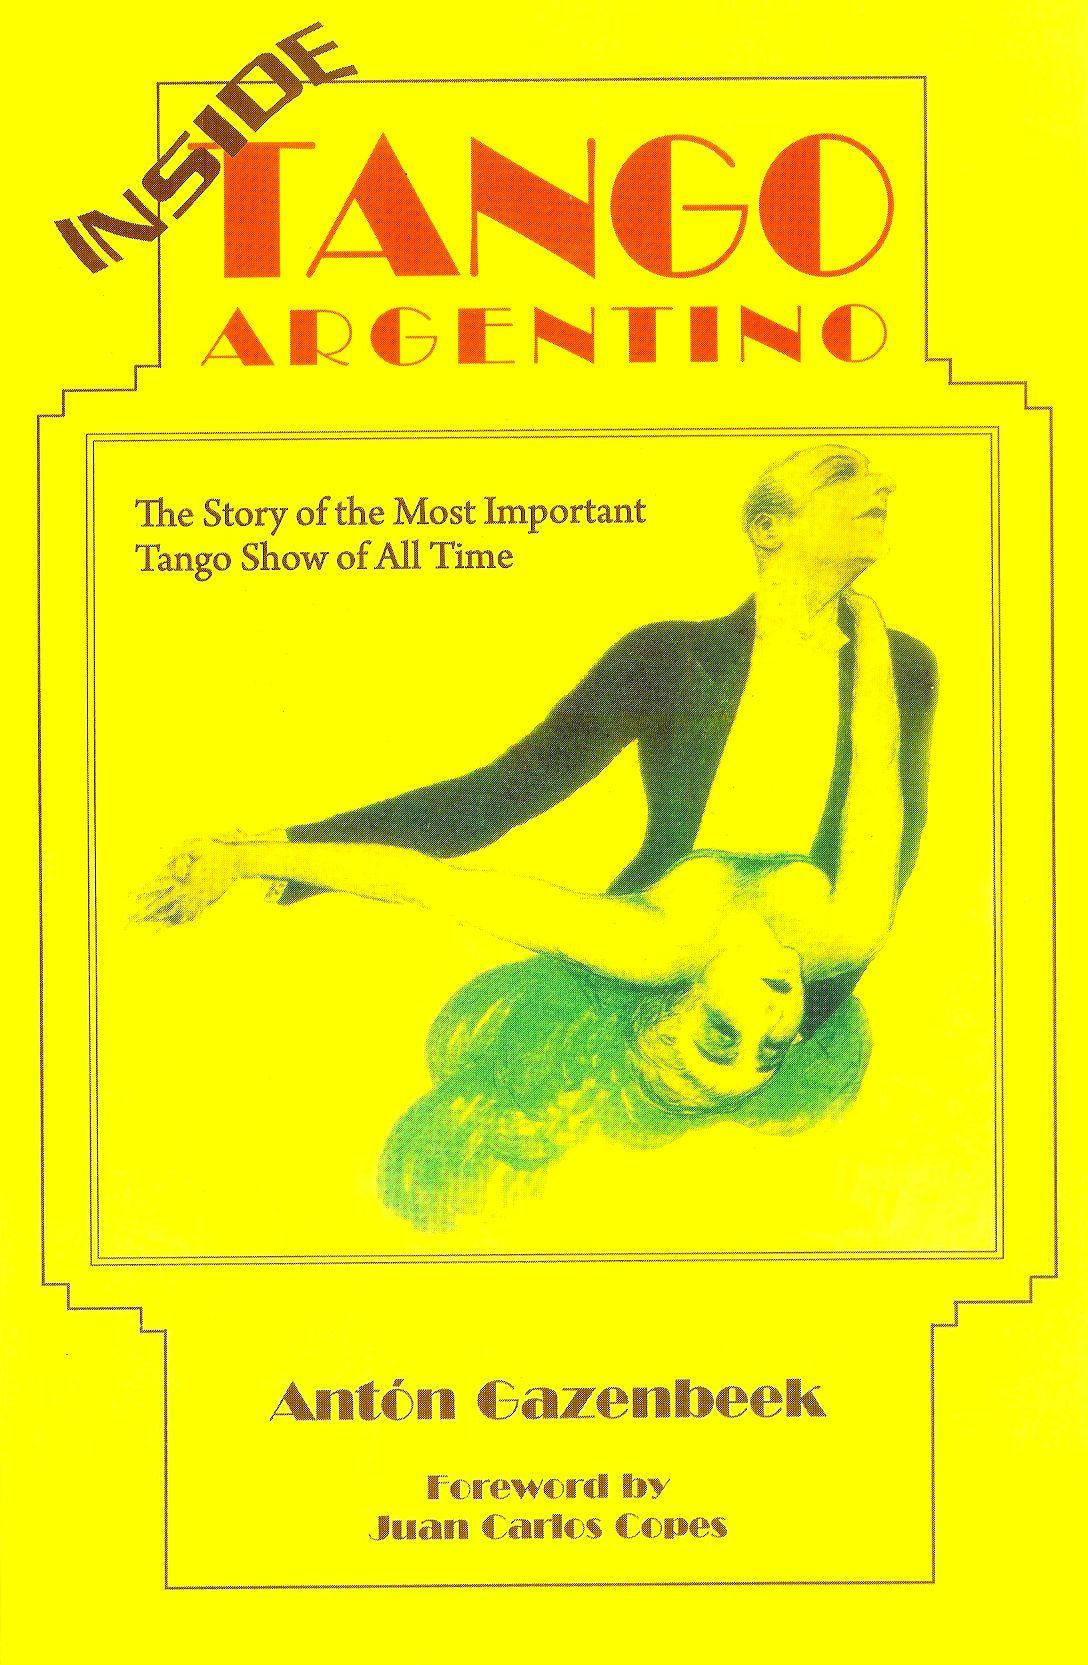 Inside Tango Argentino. - Kindle Mobi